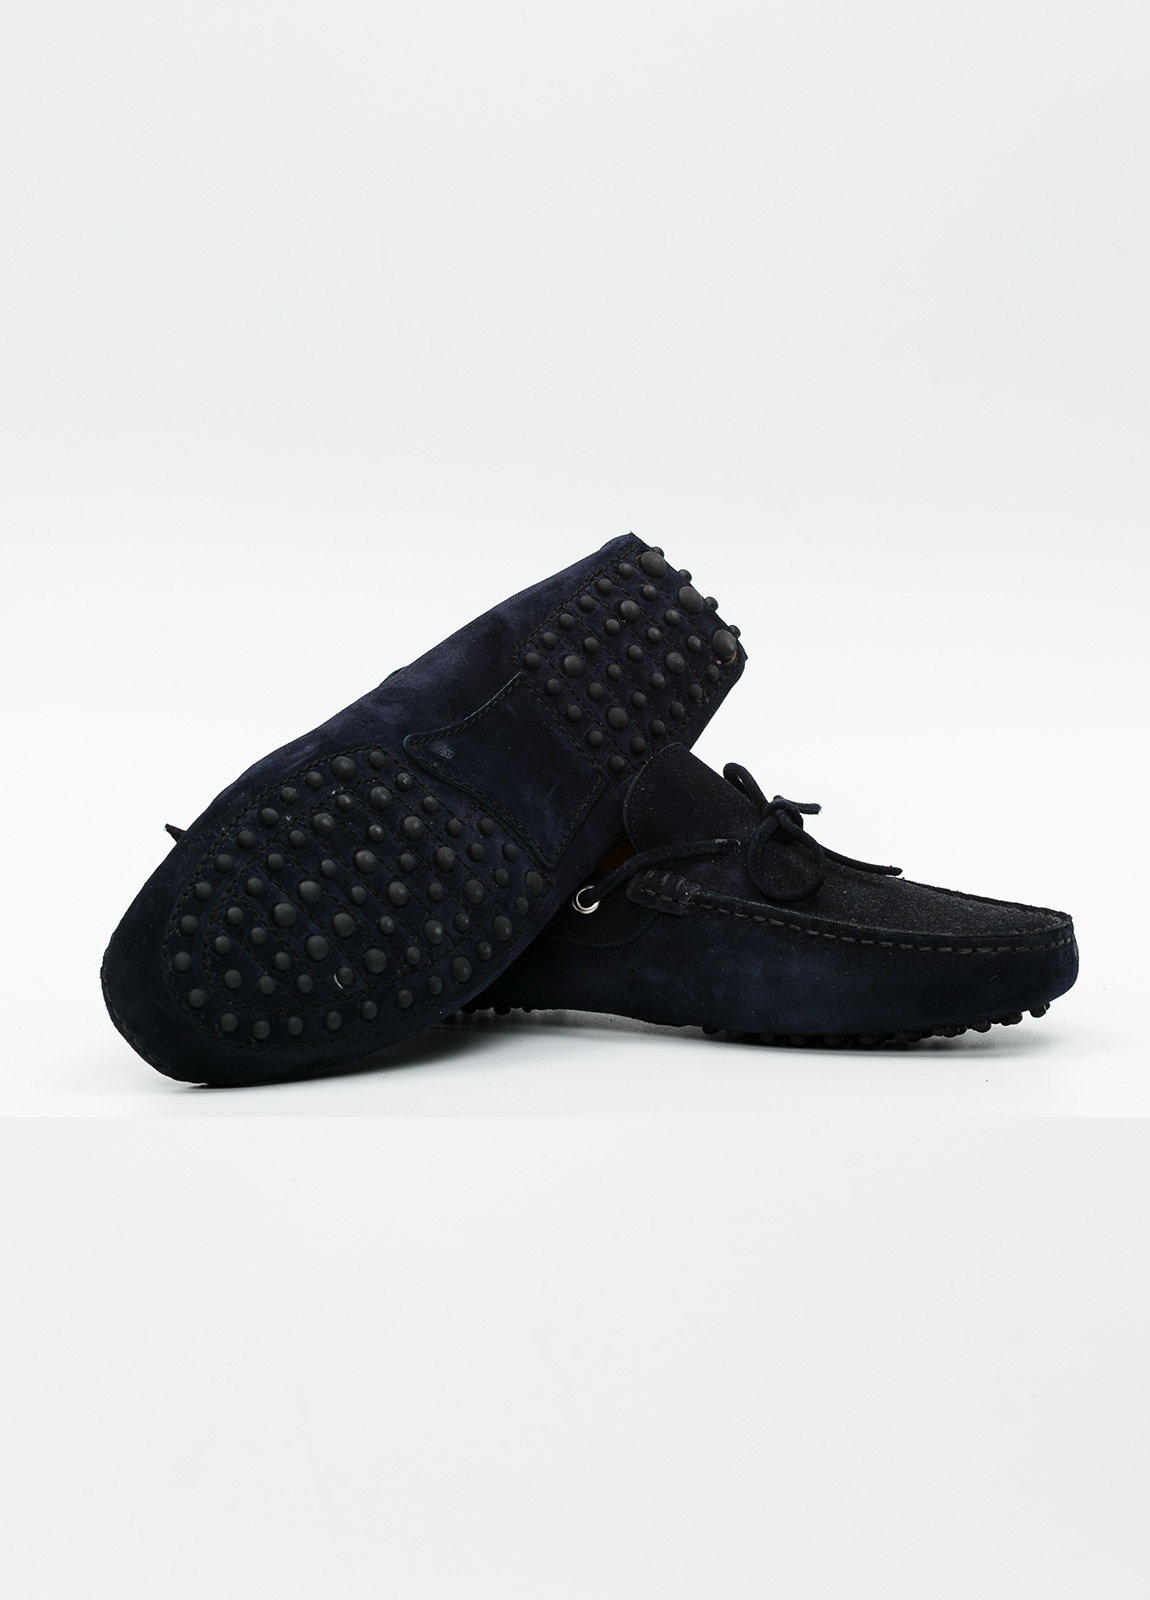 Zapato mocasín Sport color azul marino, 100% Piel. - Ítem2